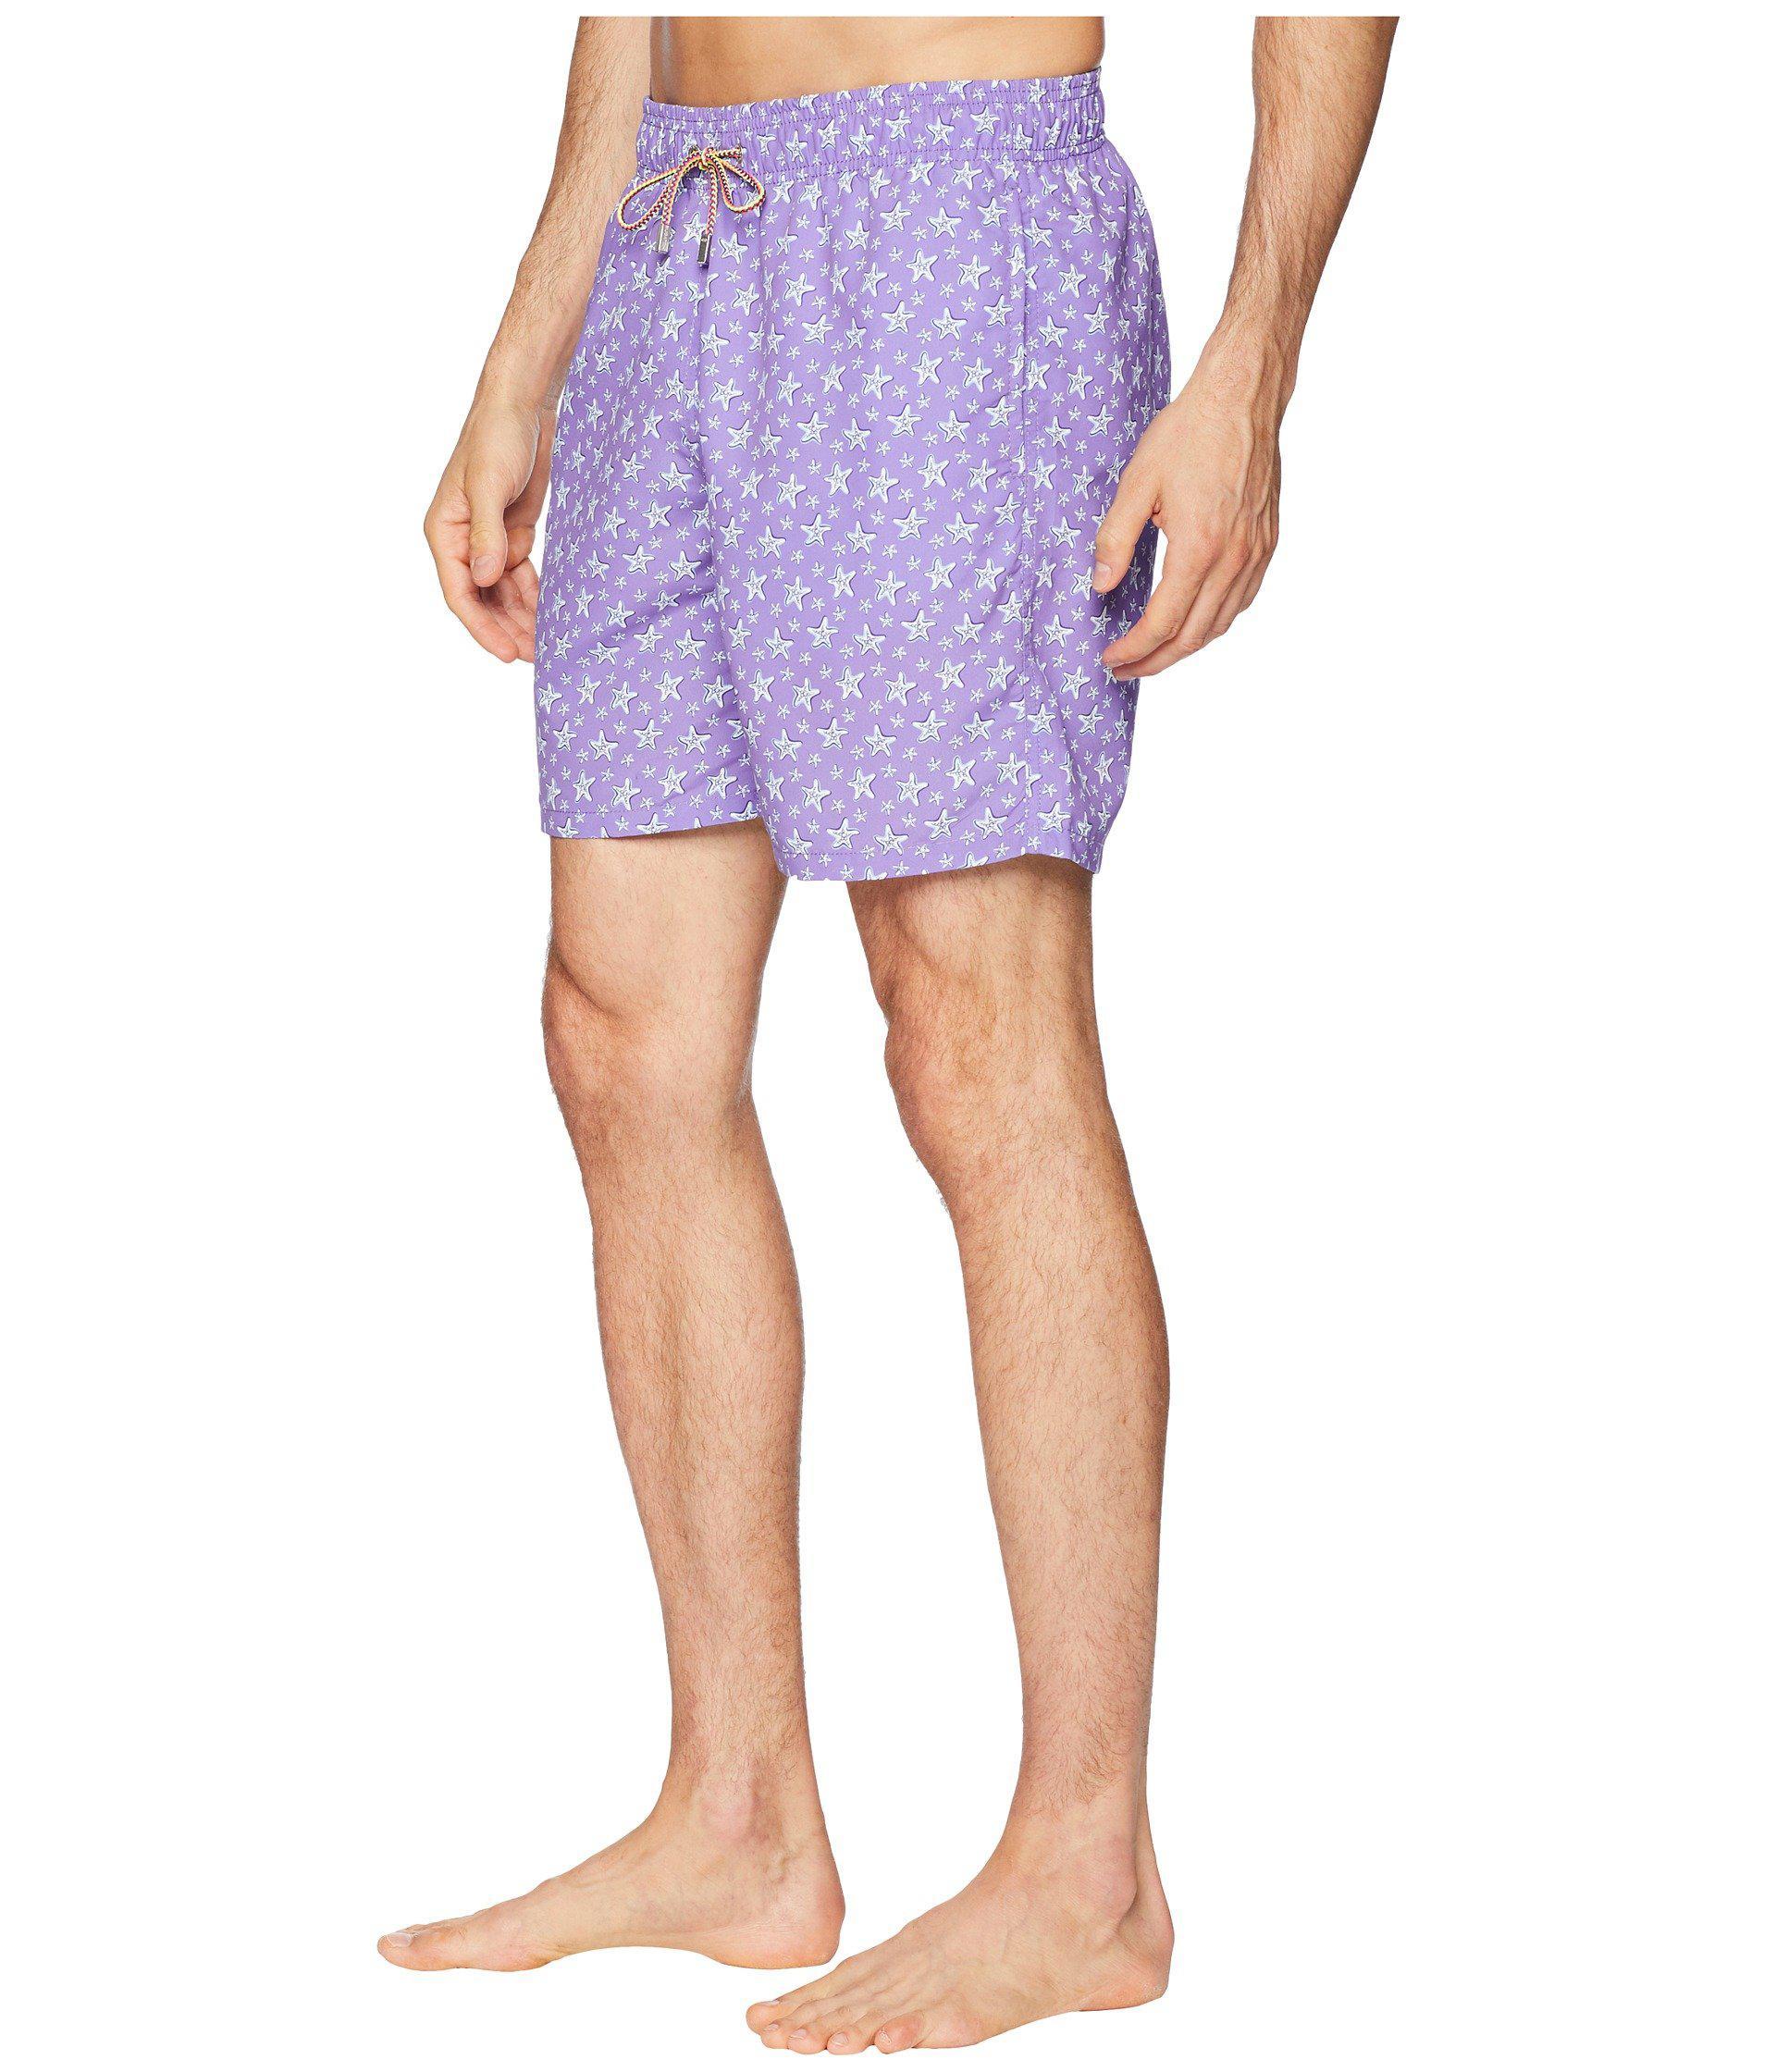 deb00fdedd Lyst - Bugatchi Starfish Toss Swim Trunk in Purple for Men - Save 21%